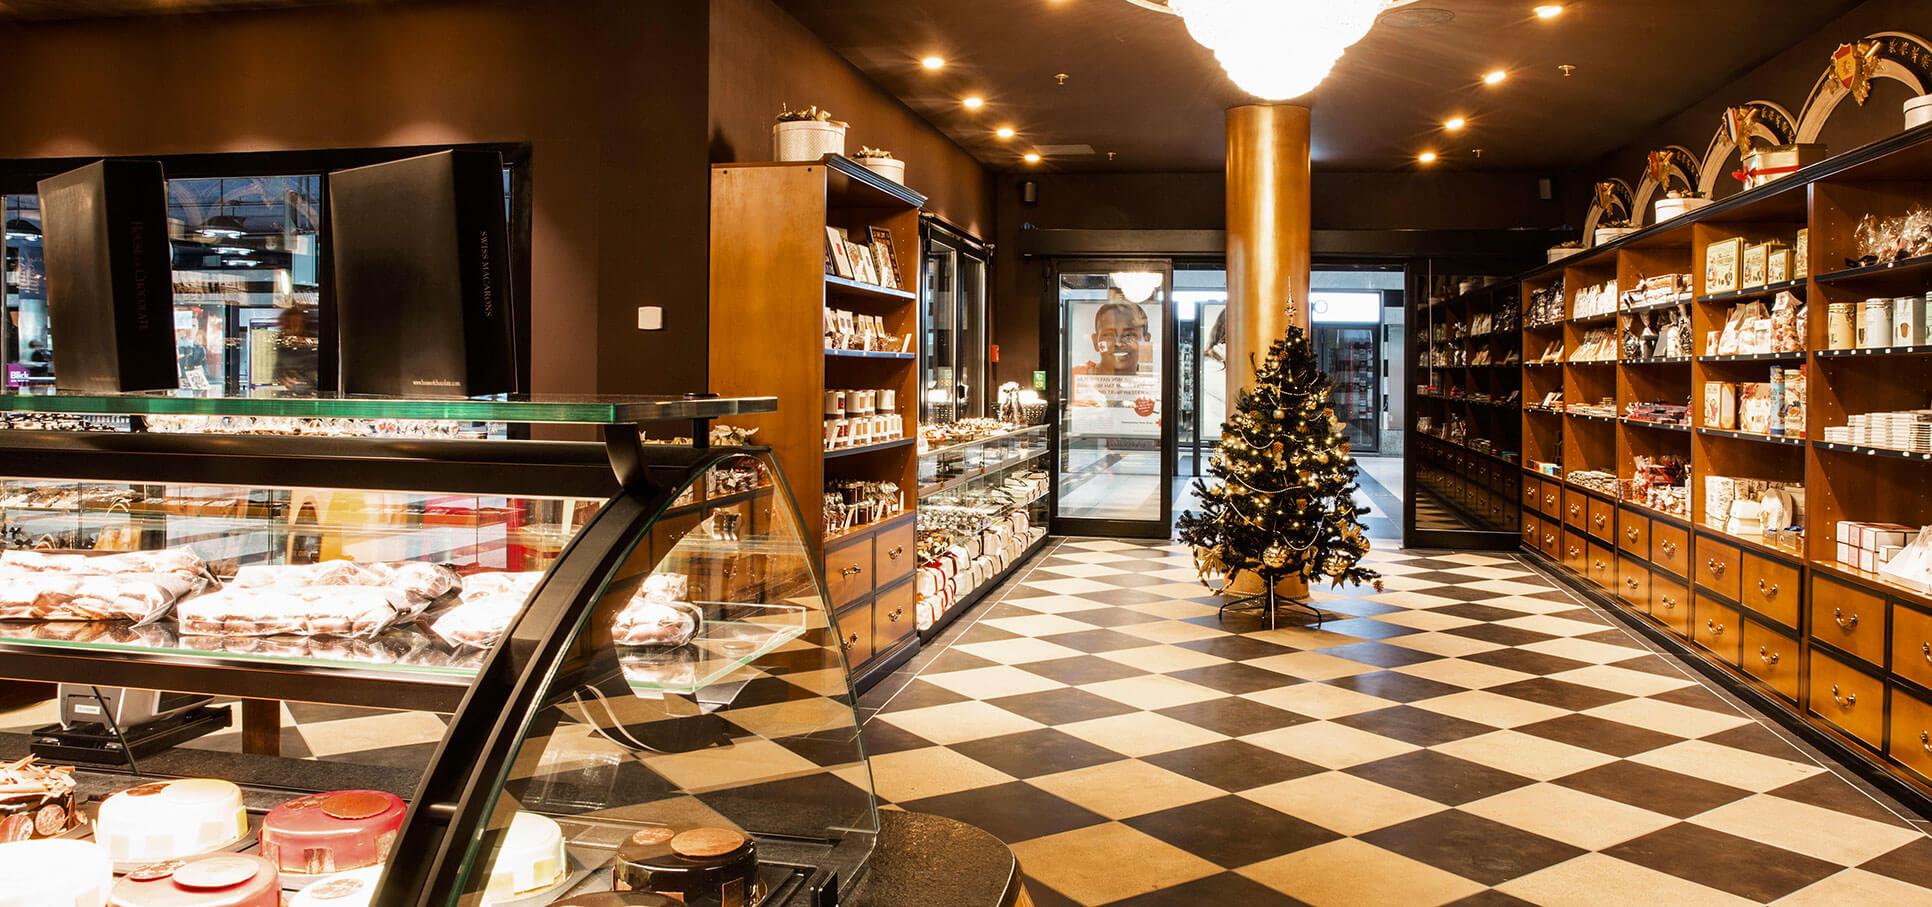 House-of-Chocolate-6-interieur-design-store-conzept-ladenbau-shop-ville-zuerich.jpg.jpg